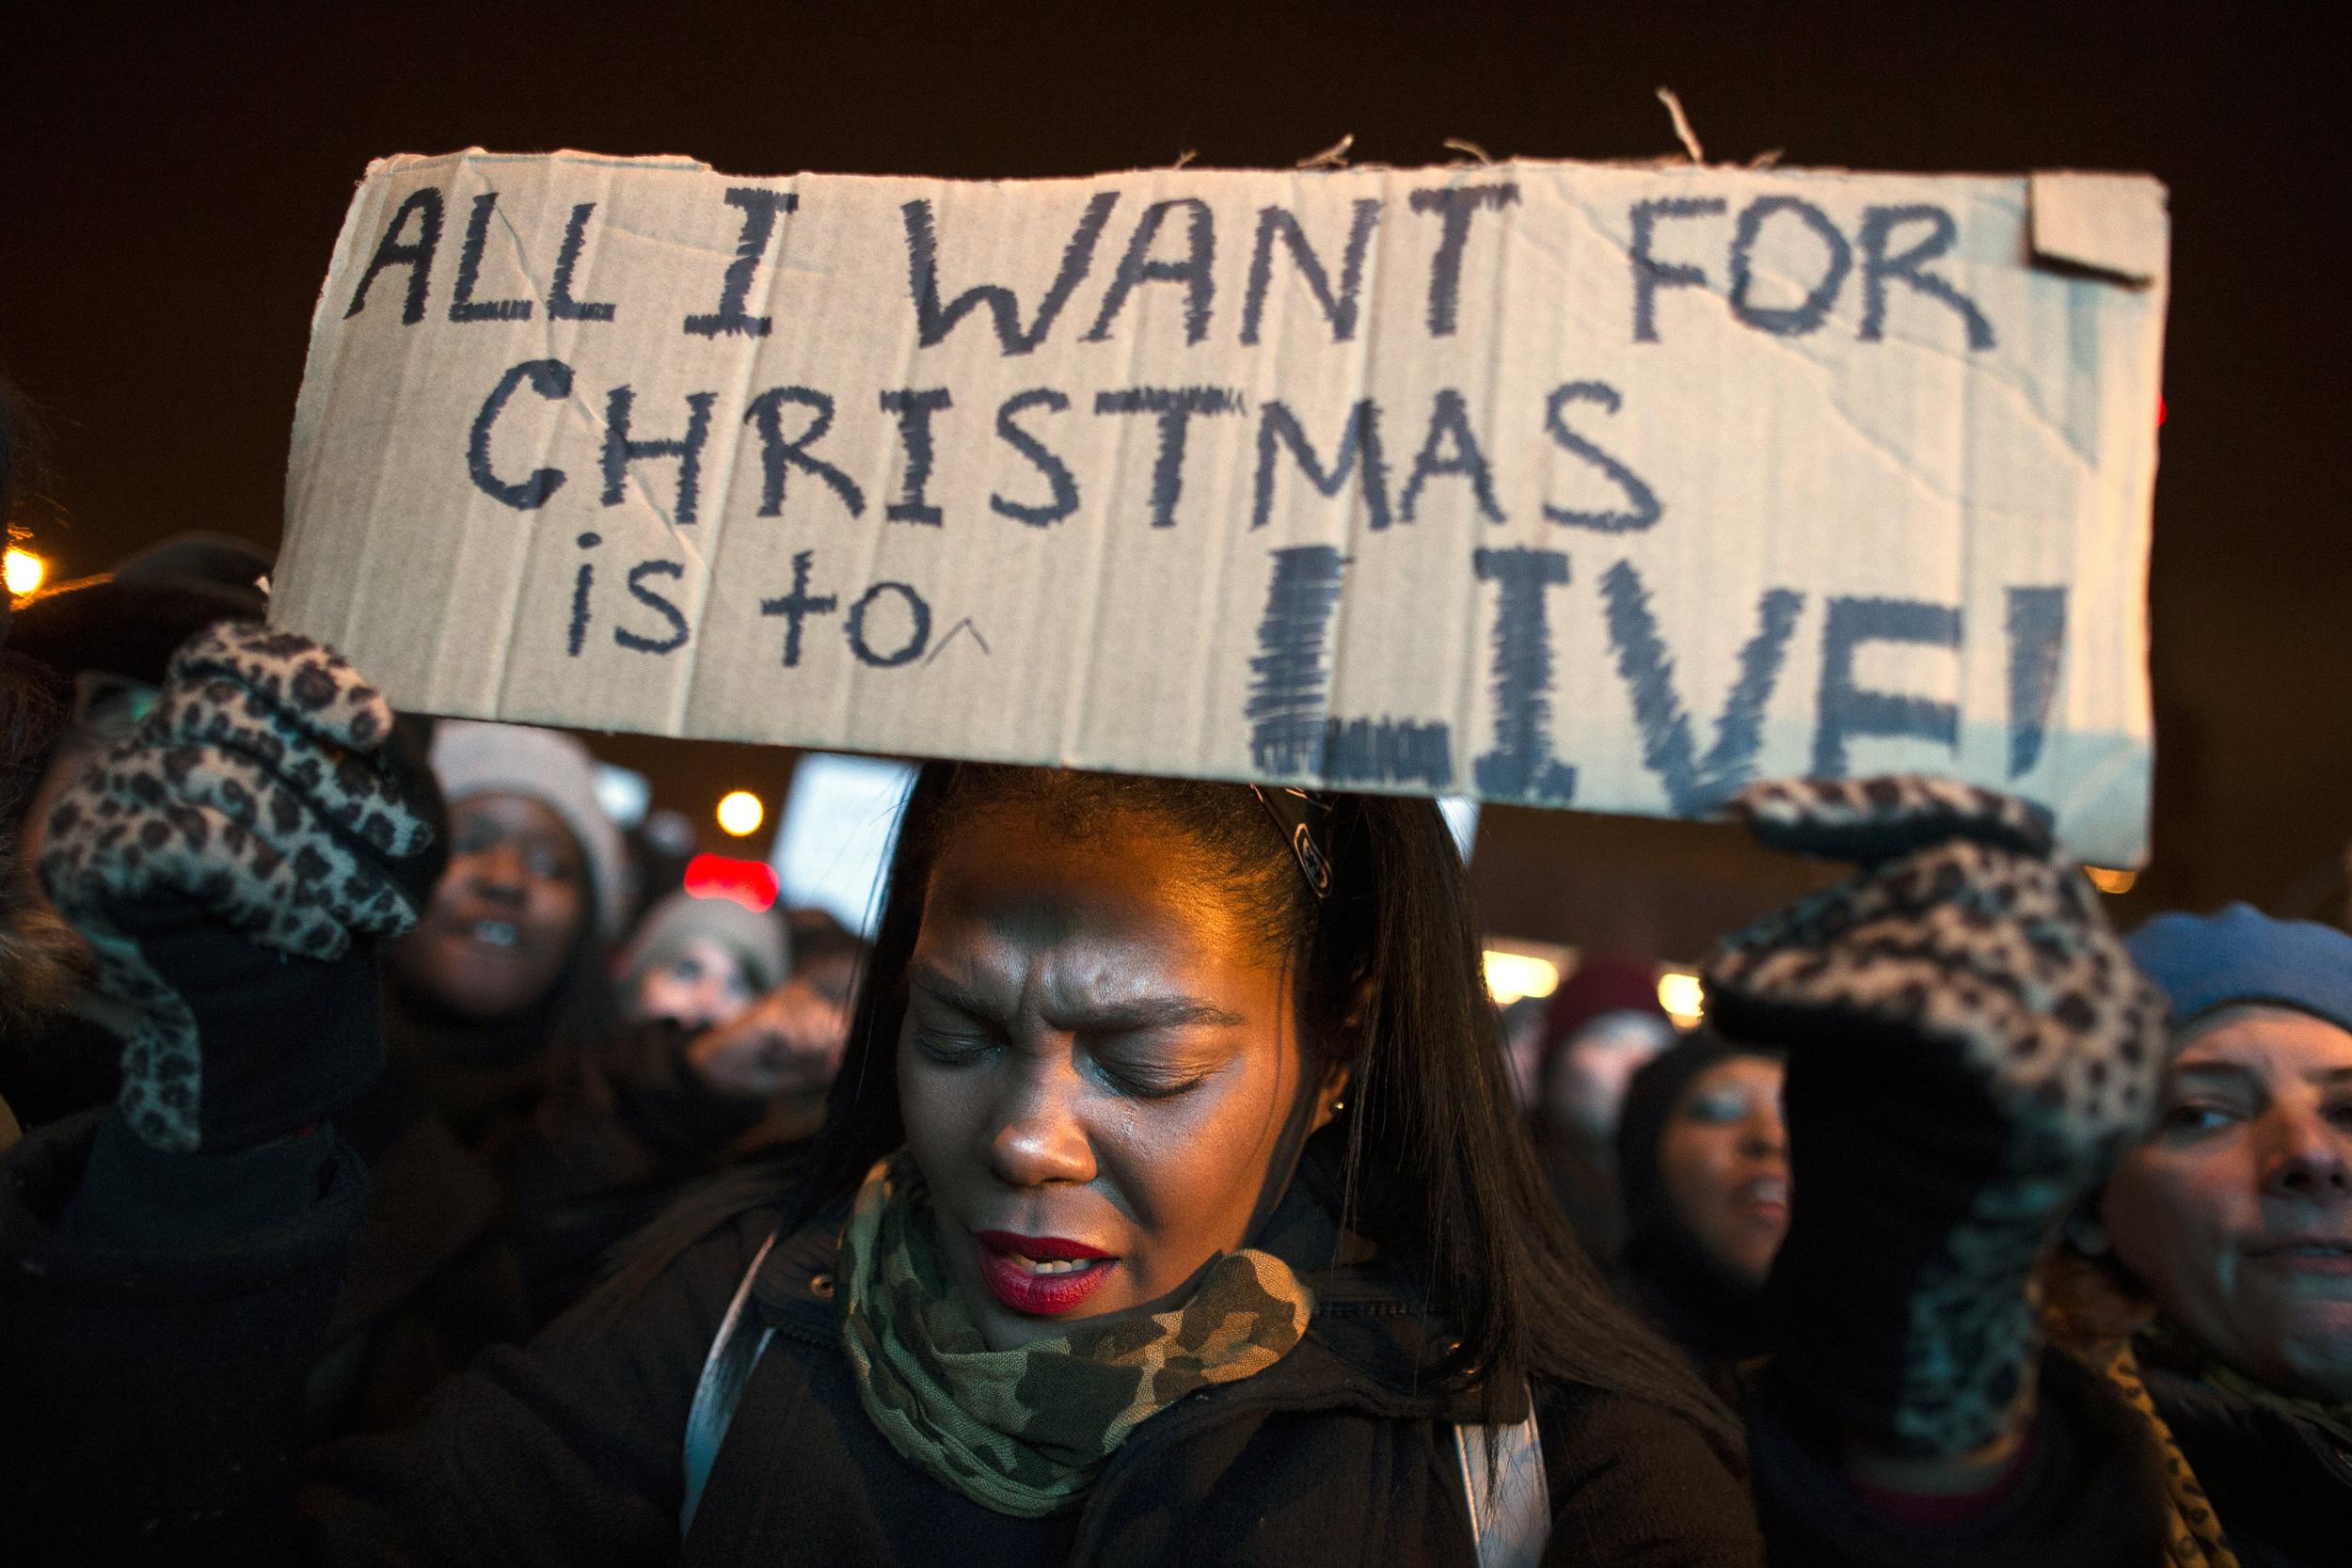 Race Relations, Racial Oppression, Race Matters, Black Lives Matters, BLM, Police Violence, Protest, KOLUMN Magazine, KOLUMN